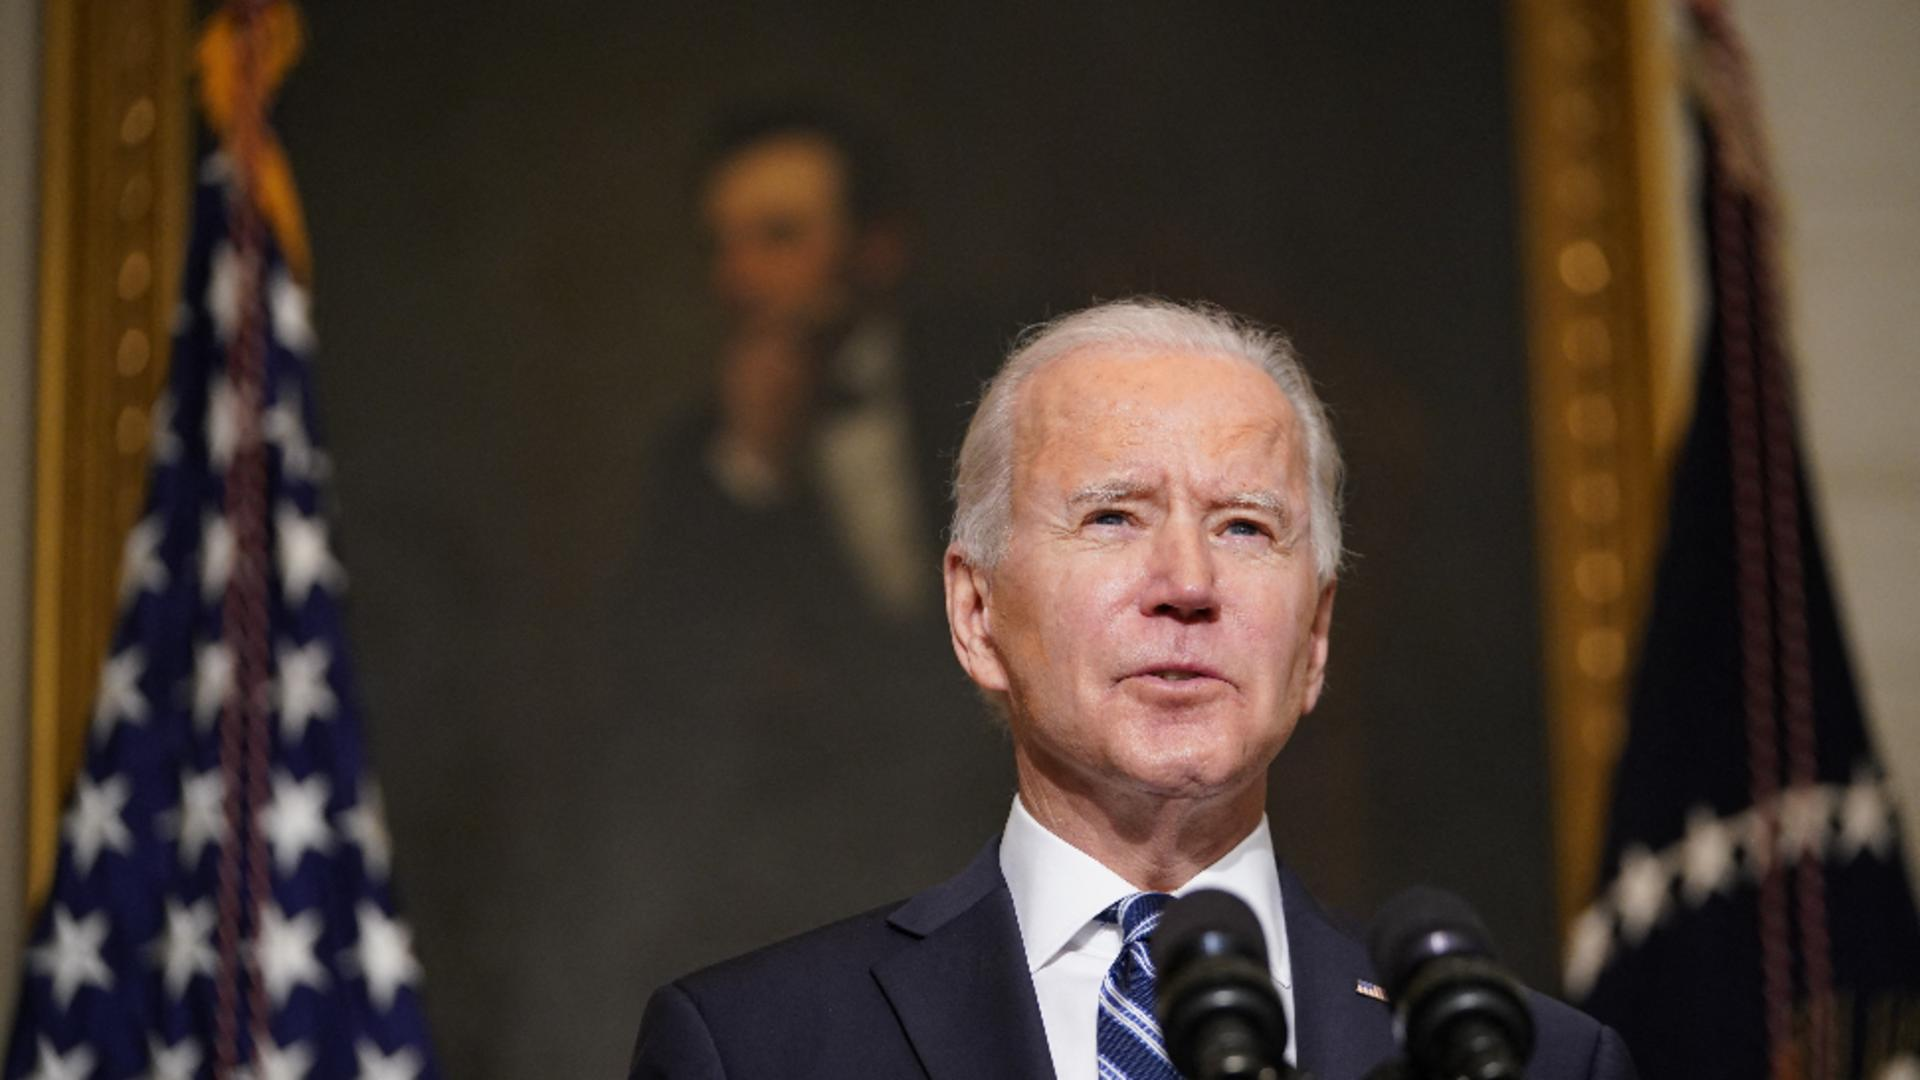 Joe Biden/sursa foto: Profi Media